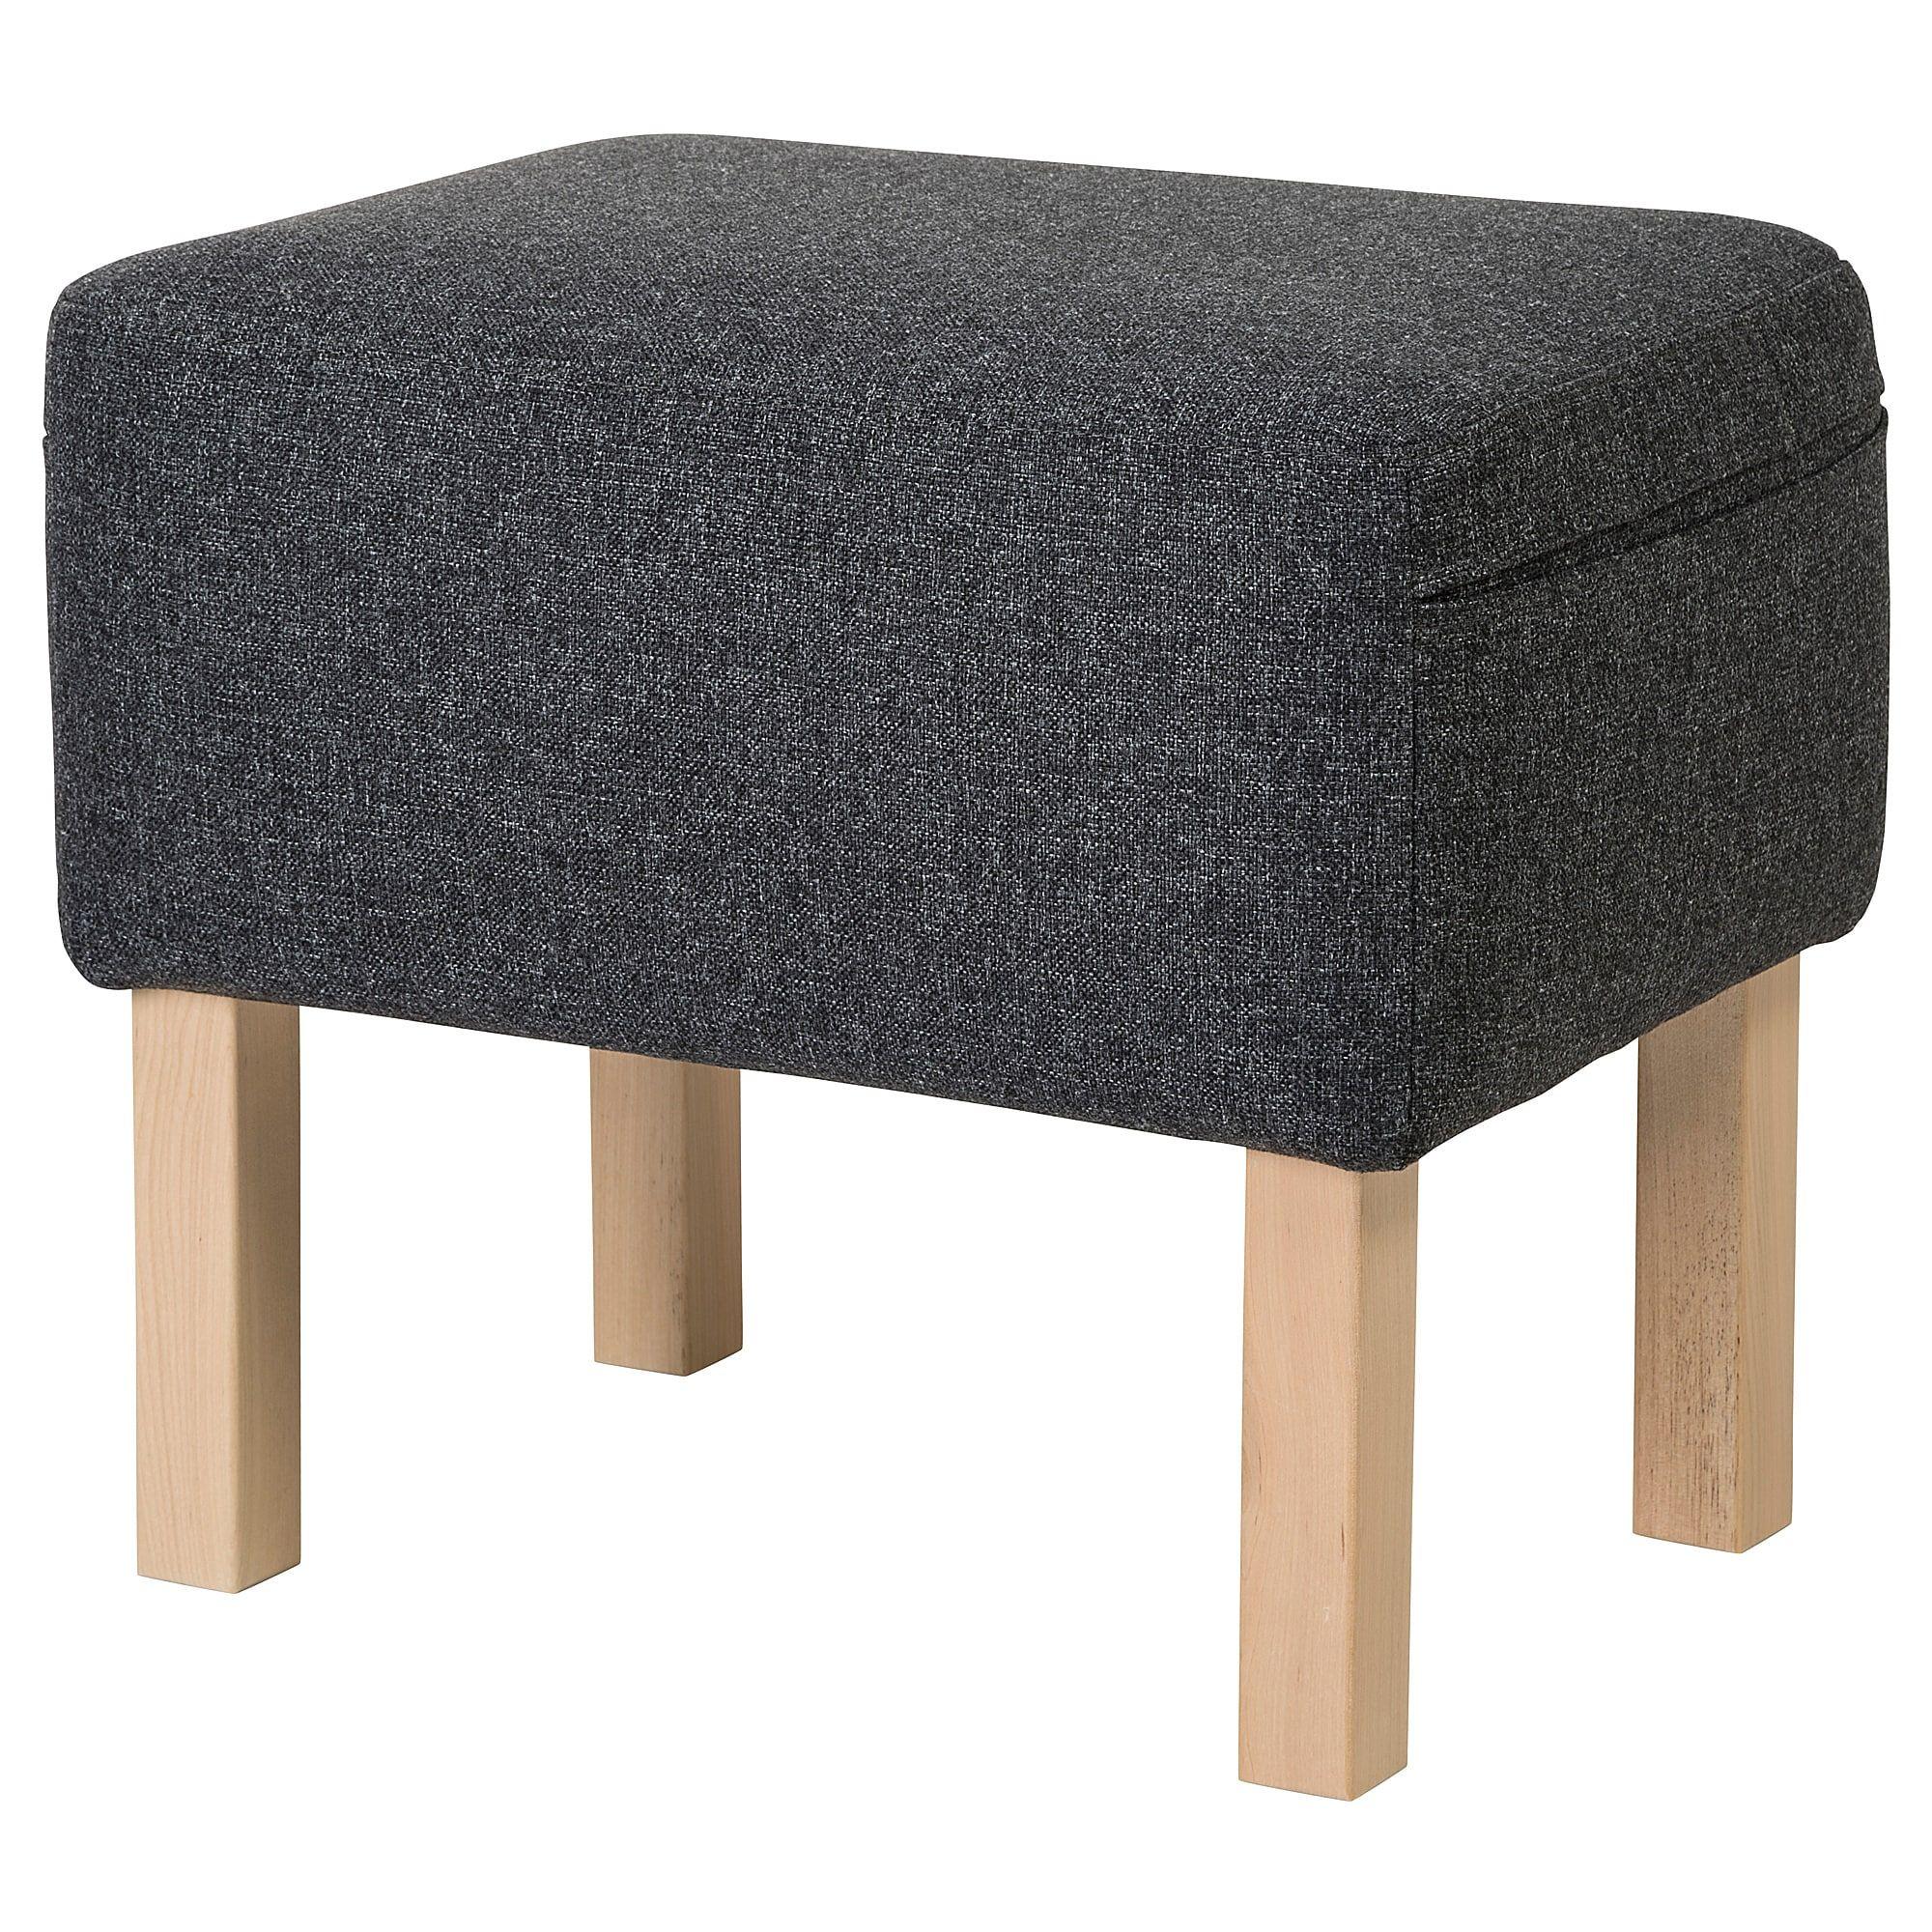 Omtanksam Ikea Footstools Pouffes Kf Ikea Footstool Pouffe Ikea